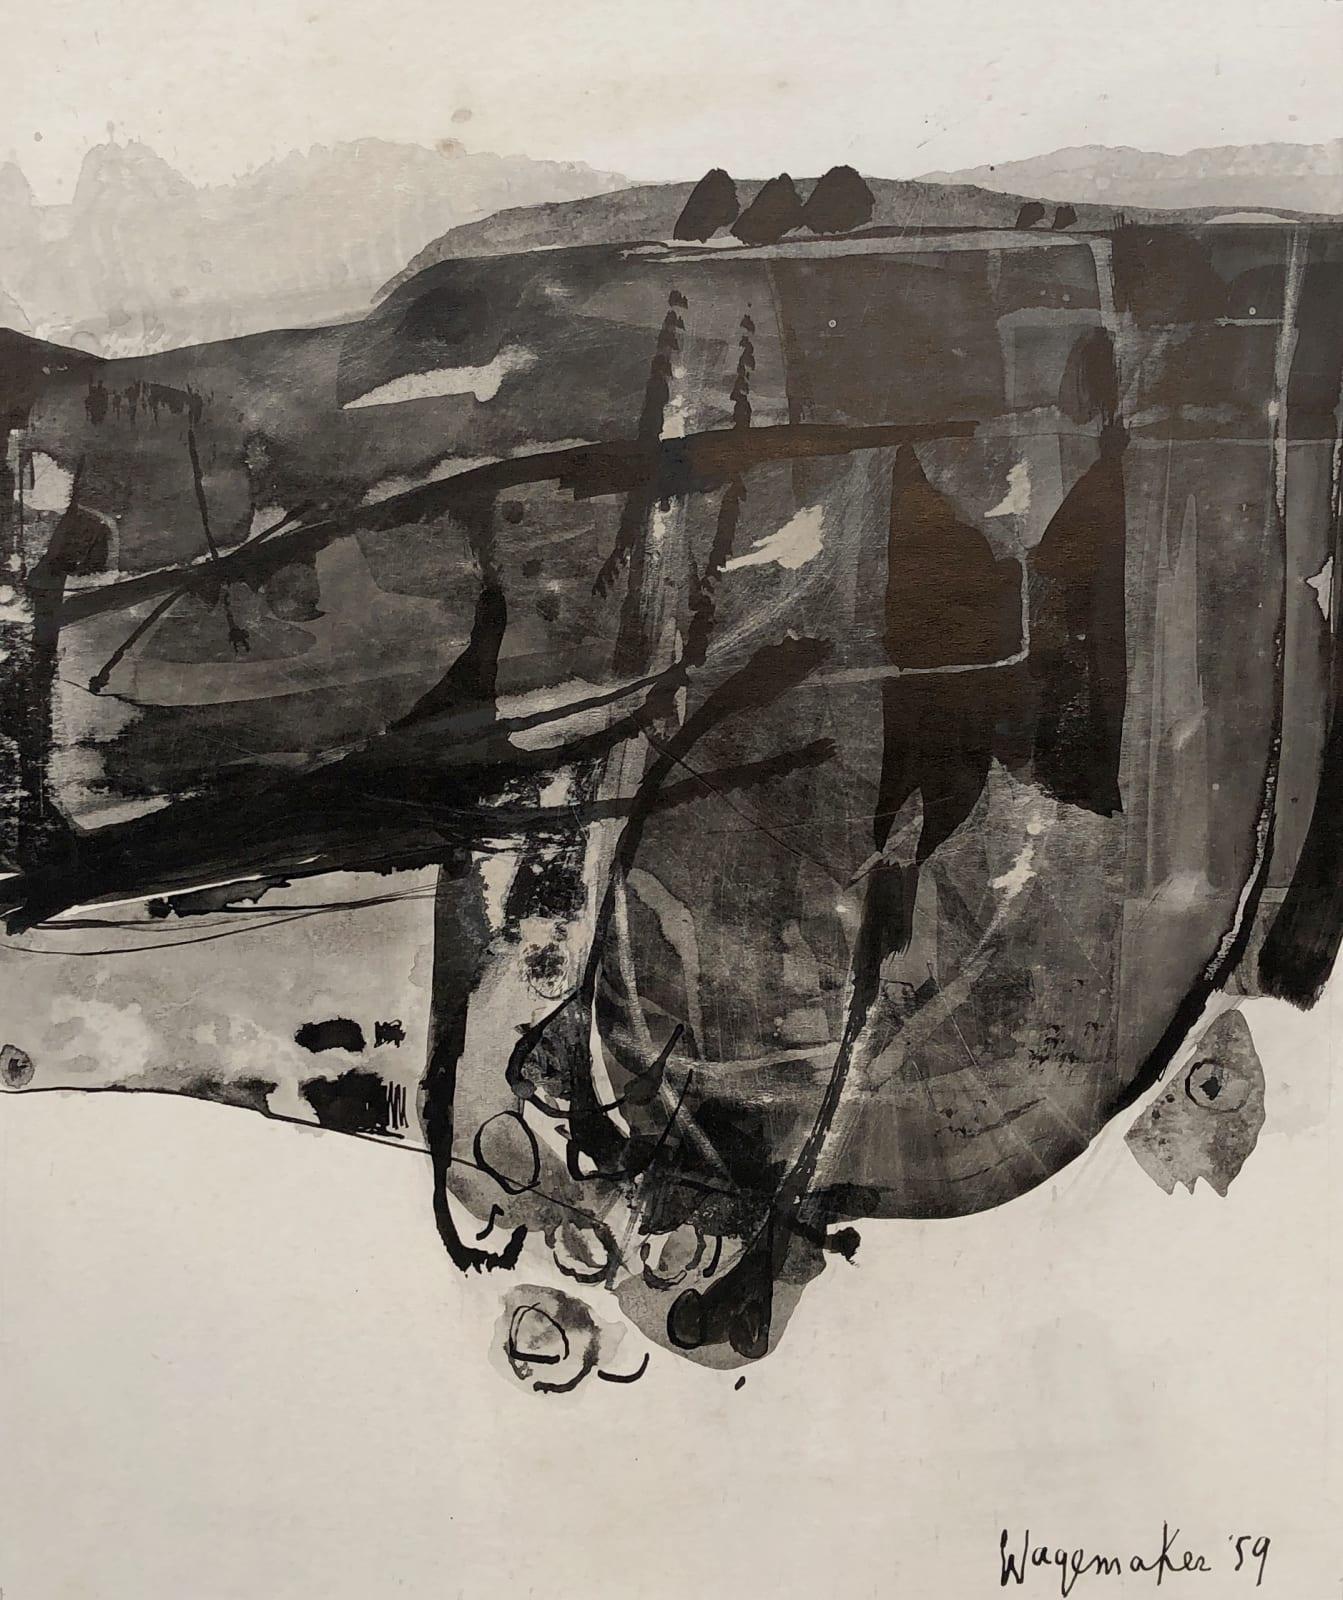 JAAP WAGEMAKER, Untitled, 1959